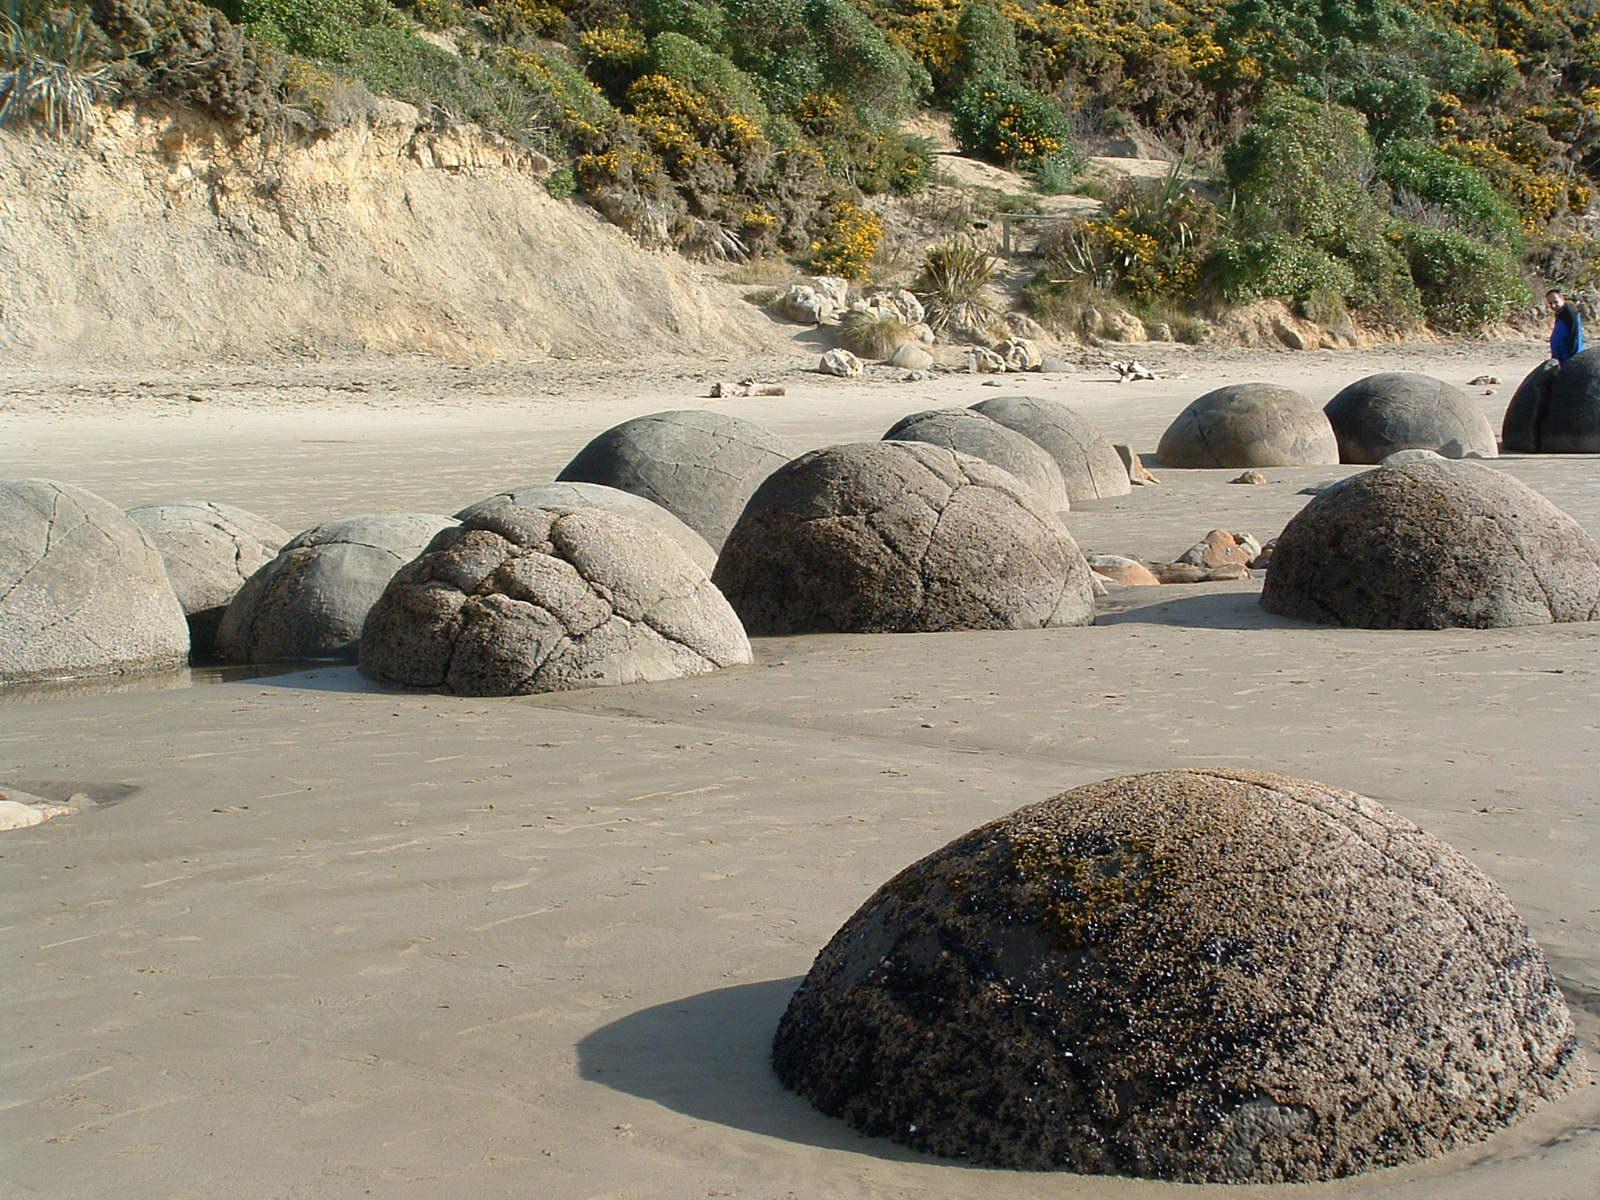 Moeraki Boulders aka NEW ZEALAND ROCKS